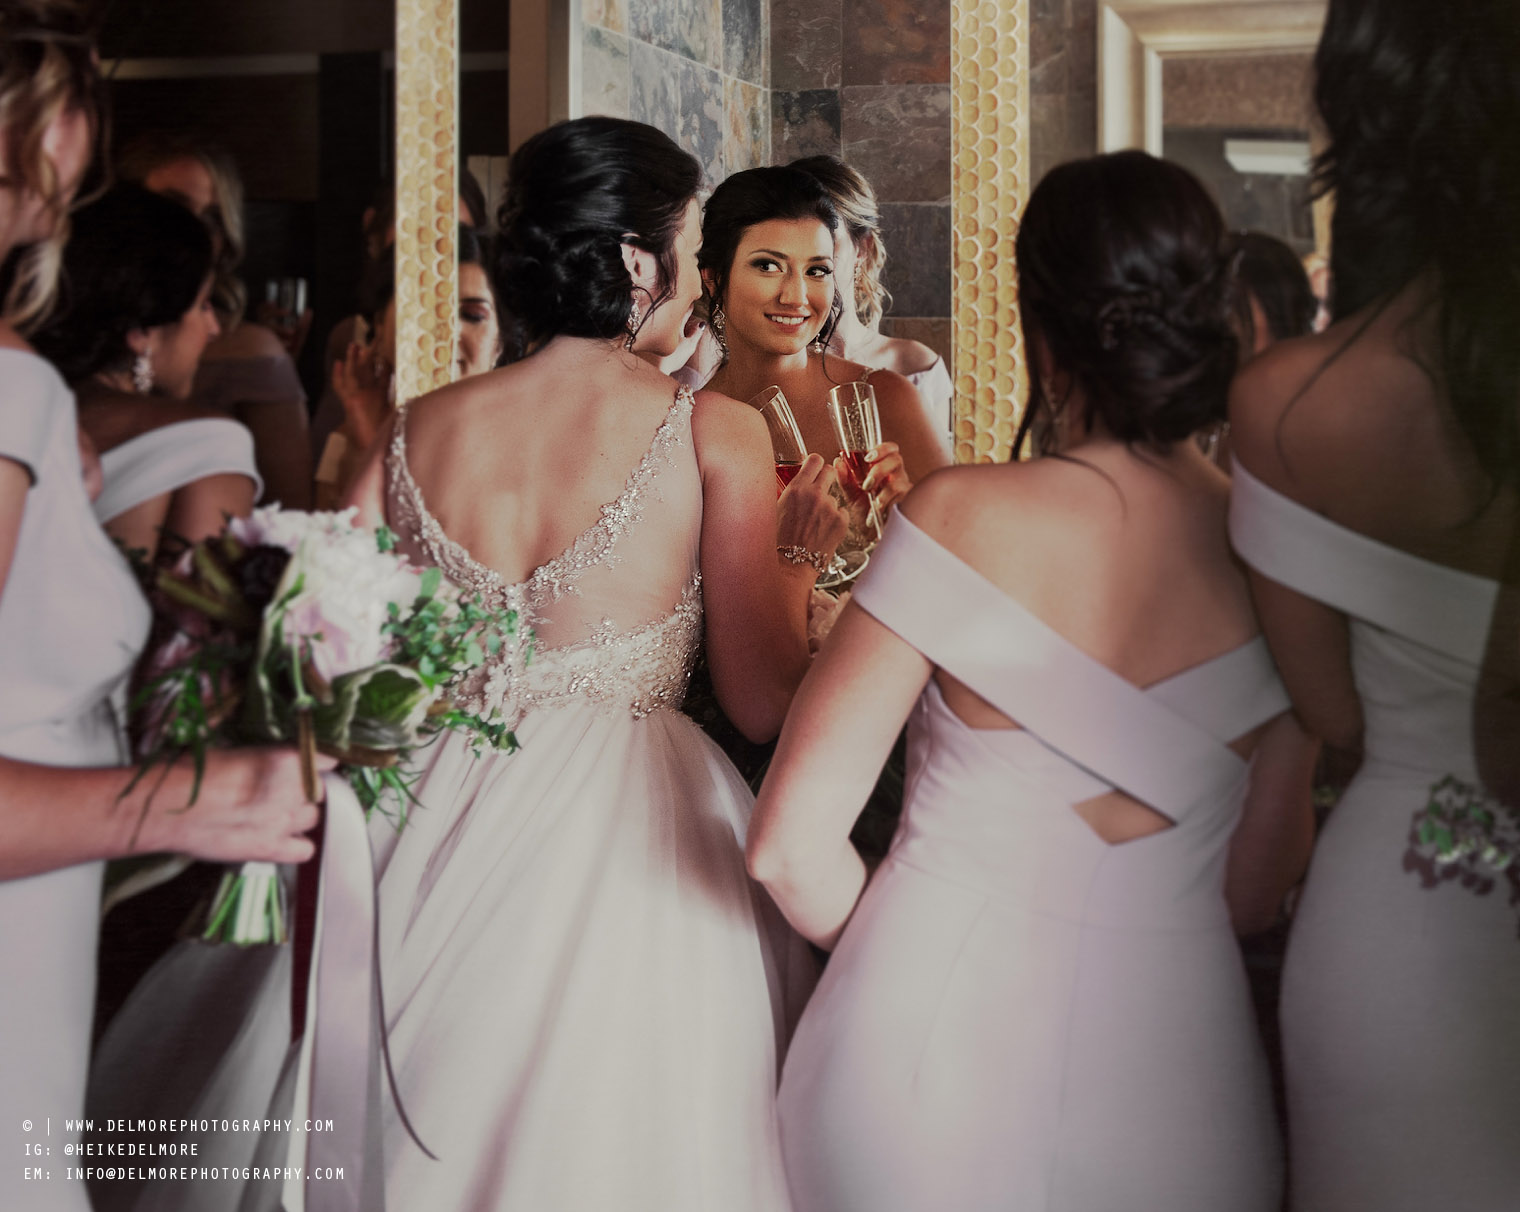 Windsor Wedding Photography Editorial Style Bathroom